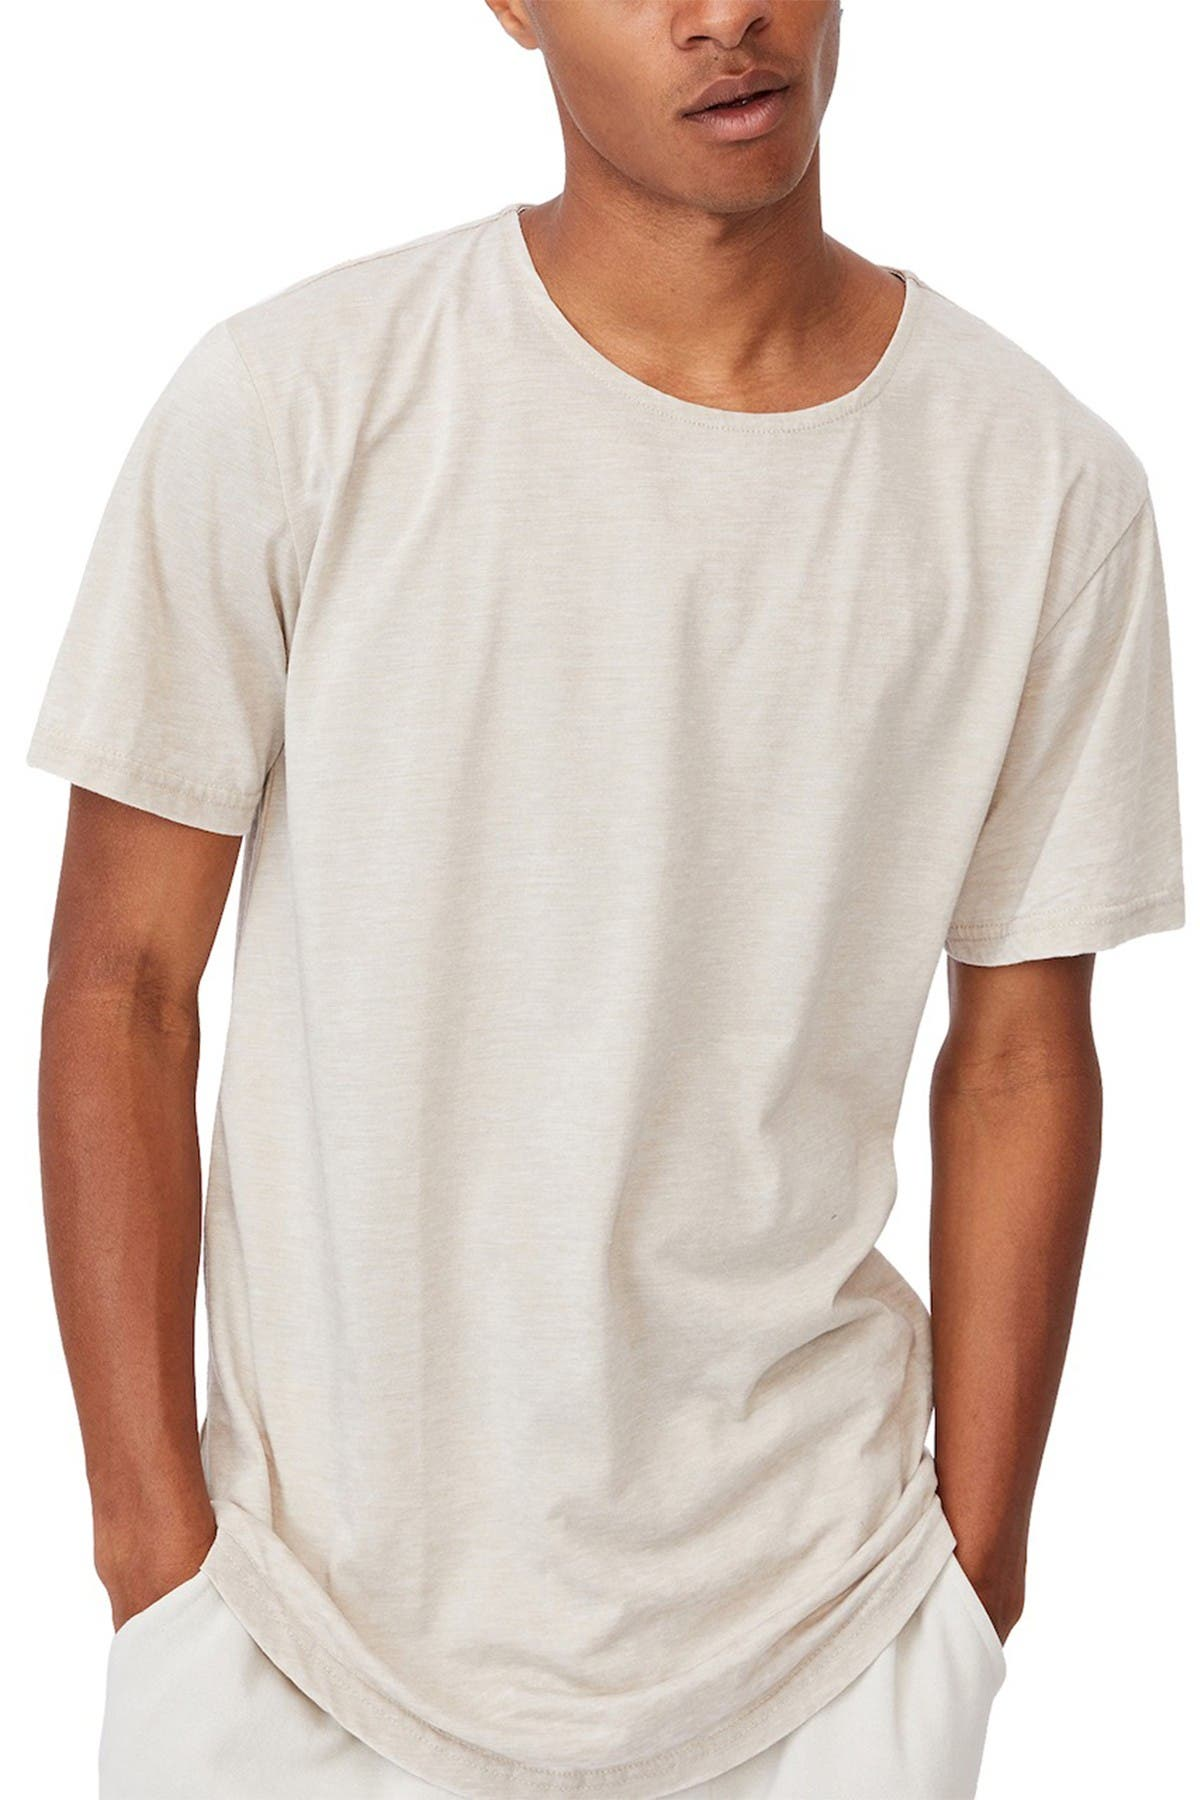 Cotton On Longline Scoop Burnout T-Shirt at Nordstrom Rack